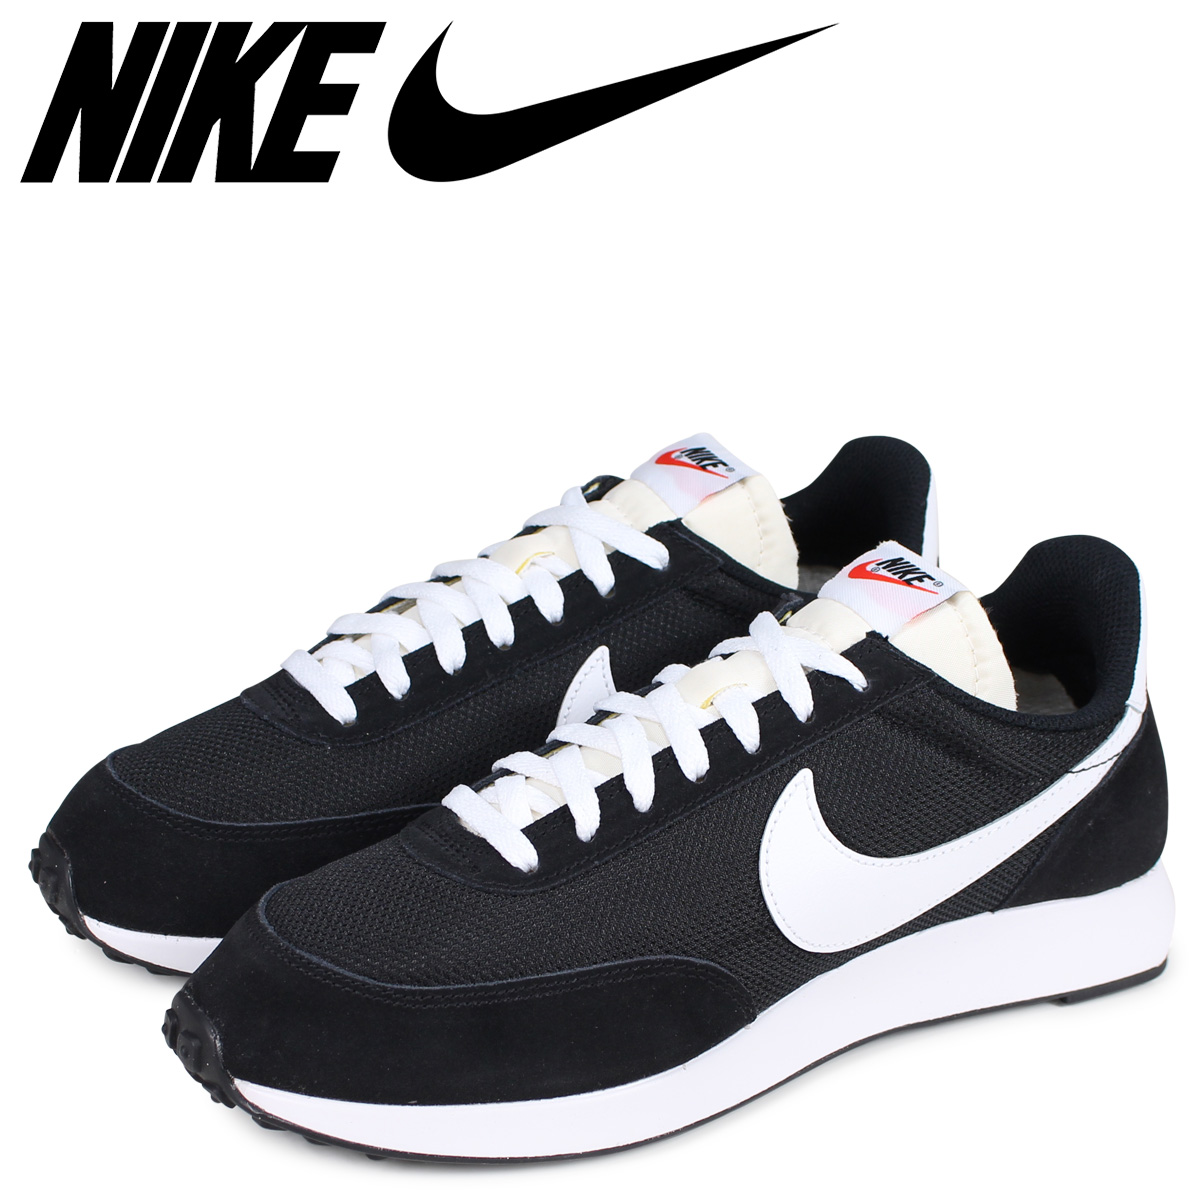 premium selection 7b837 8766f NIKE Kie Ney expectation yl wind 79 sneakers men AIR TAILWIND 79 black  black 487,754-009